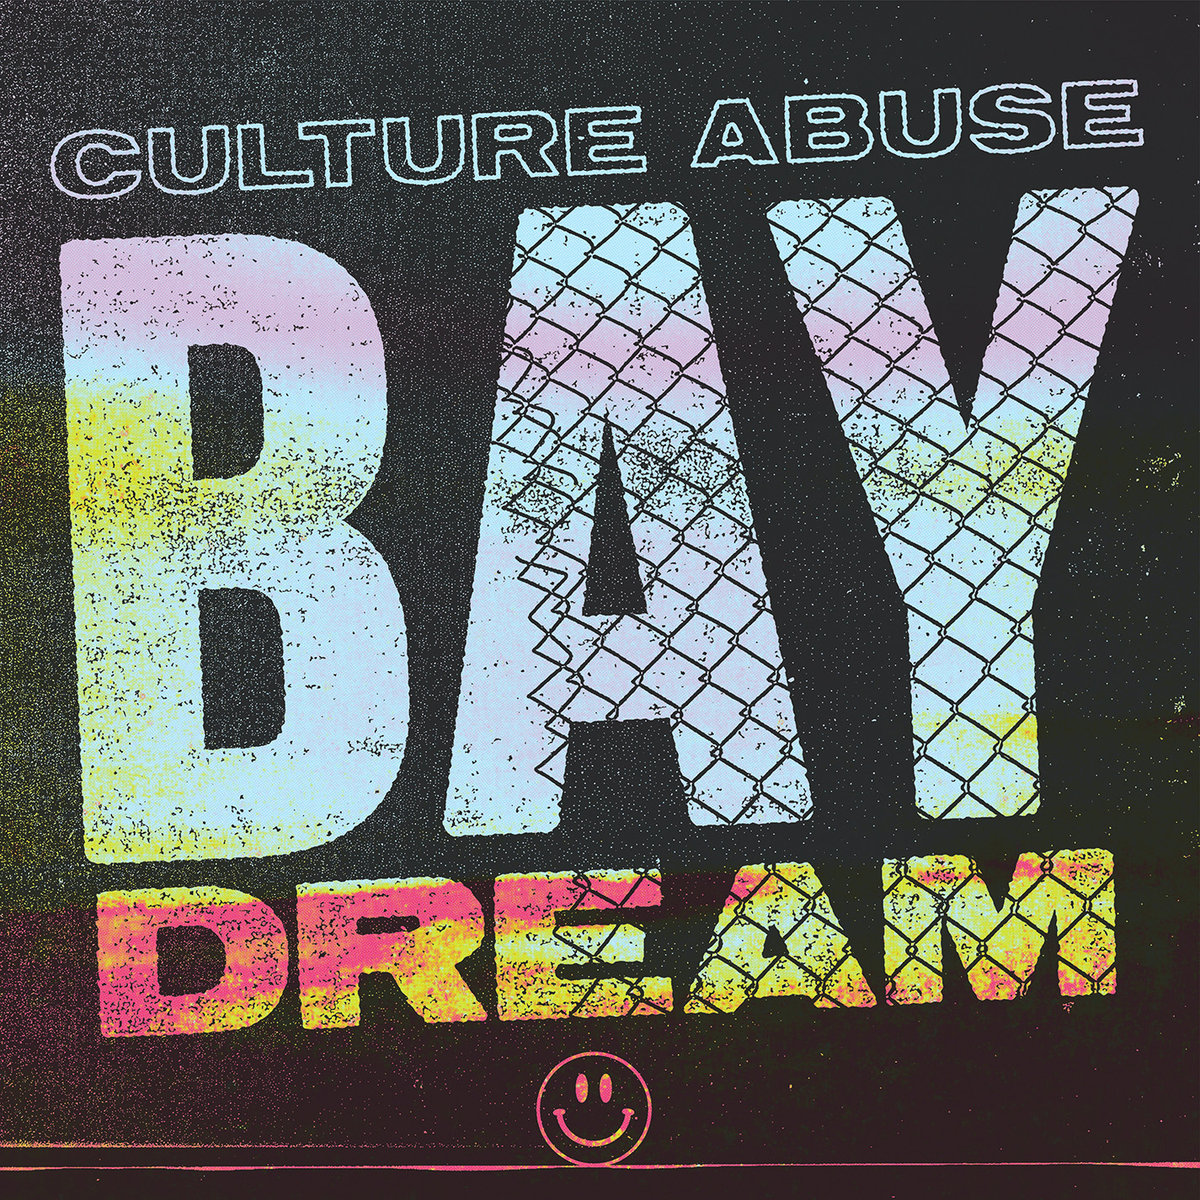 Culture Abuse - Bay Dream LP / CD / TAPE